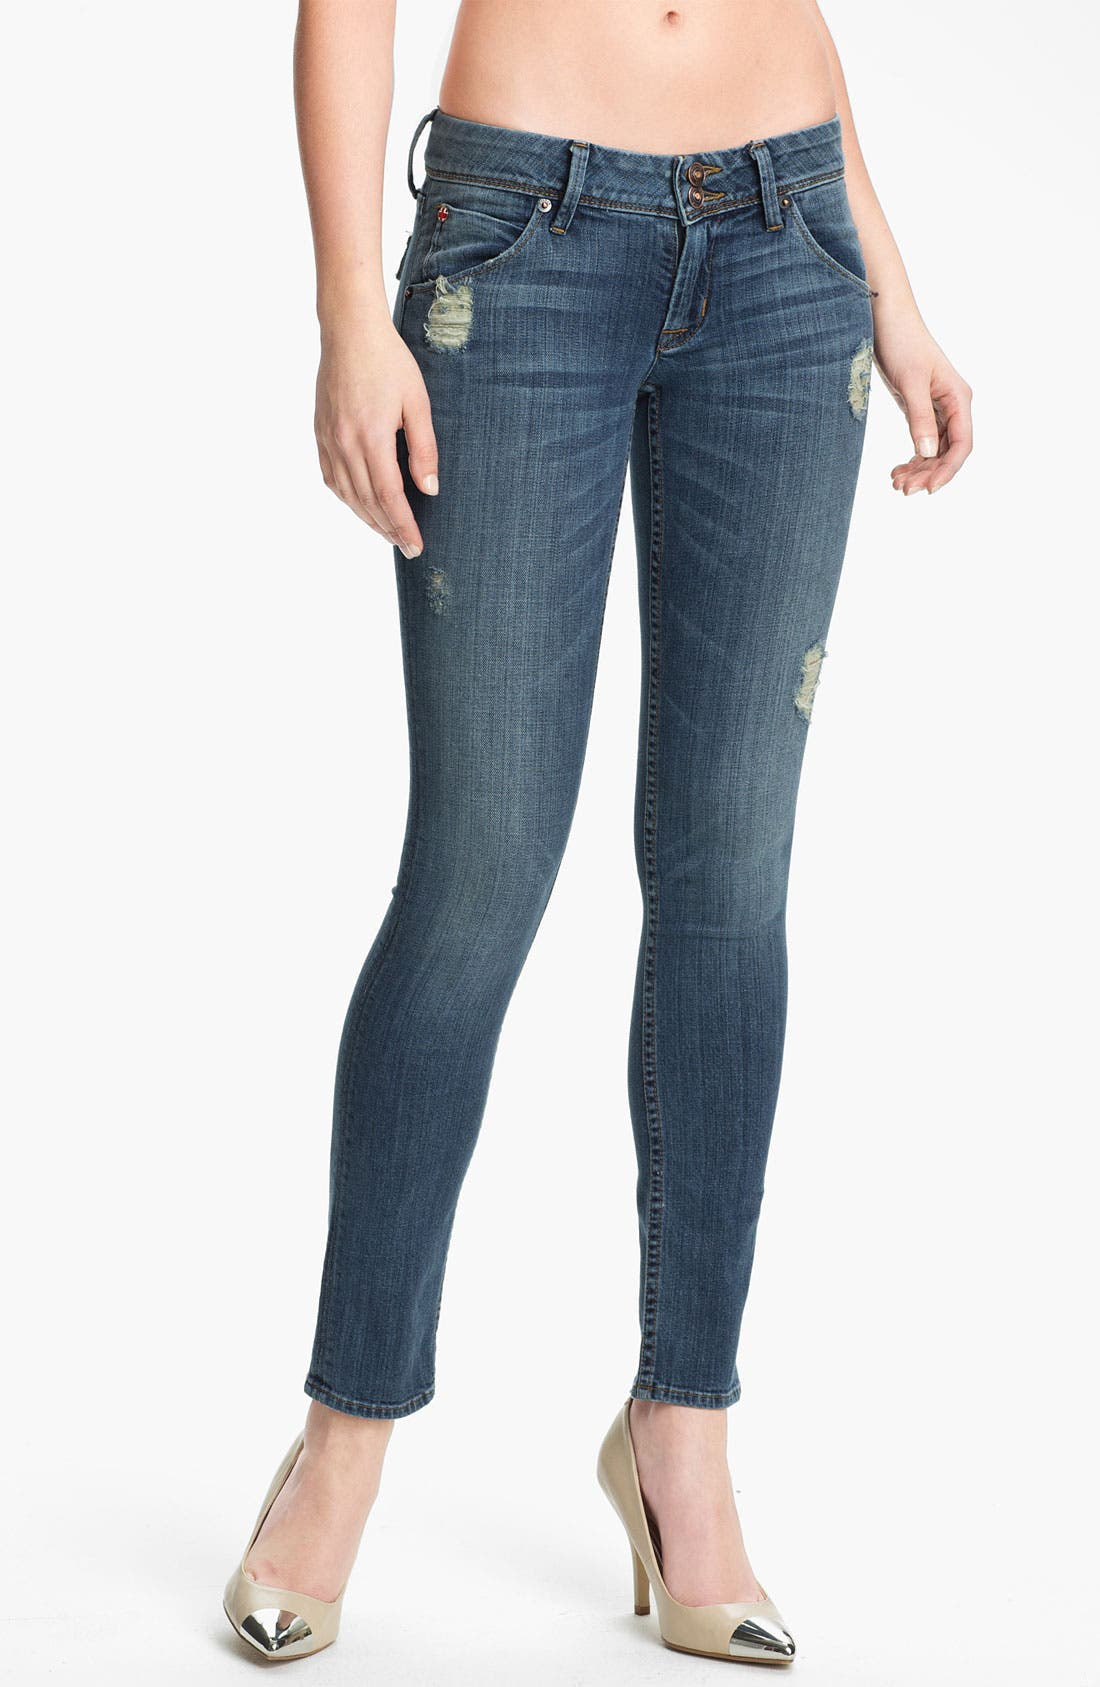 Alternate Image 1 Selected - Hudson Jeans Skinny Stretch Jeans (Vintage Napoli)